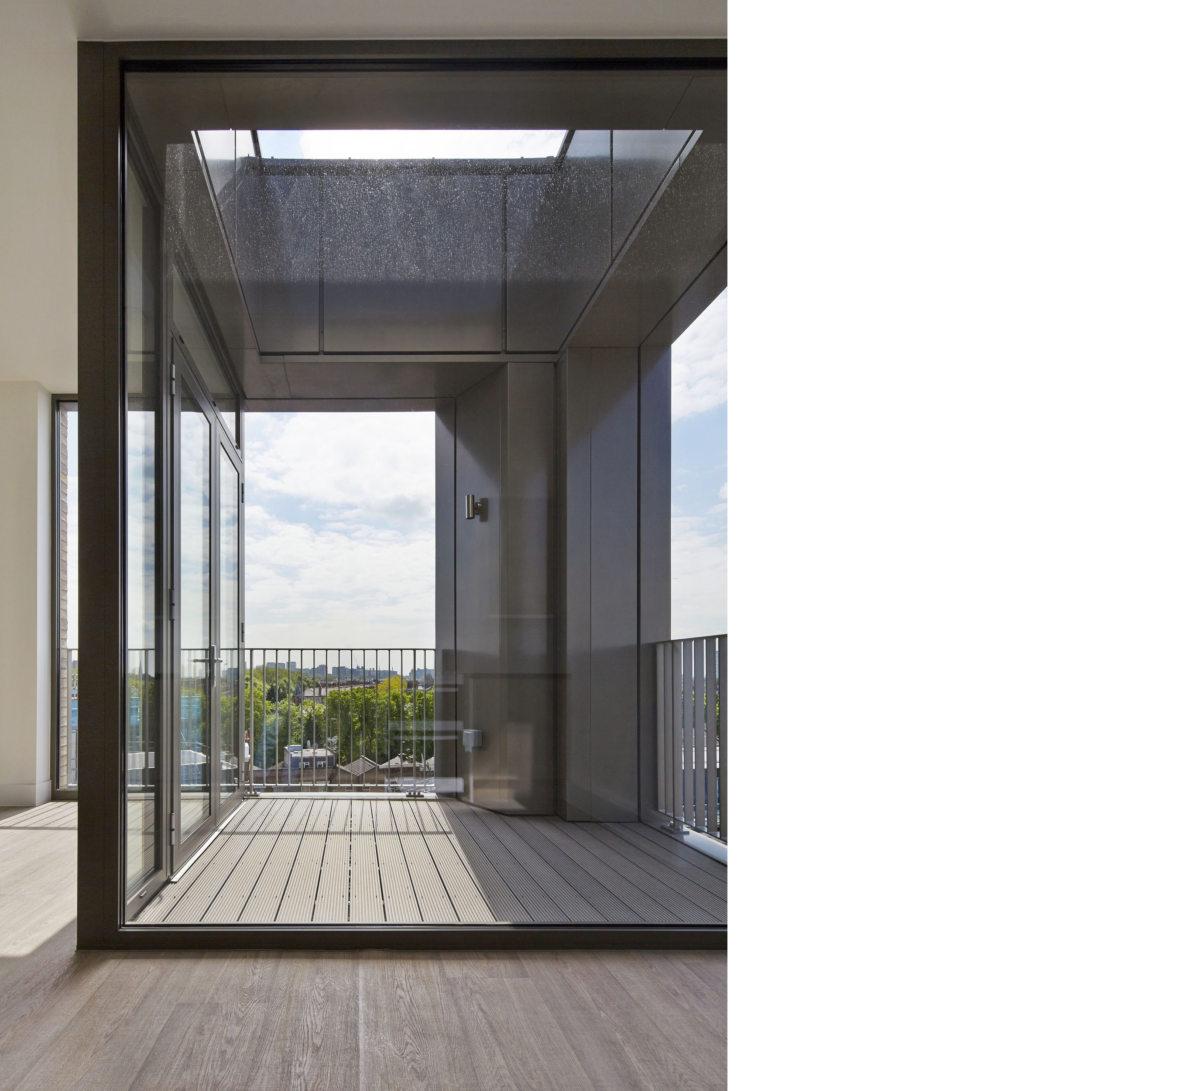 Alison Brooks Architects _ South Kilburn Estate Regeneration _ Bronte and Fielding _ Photo Interior Balcony